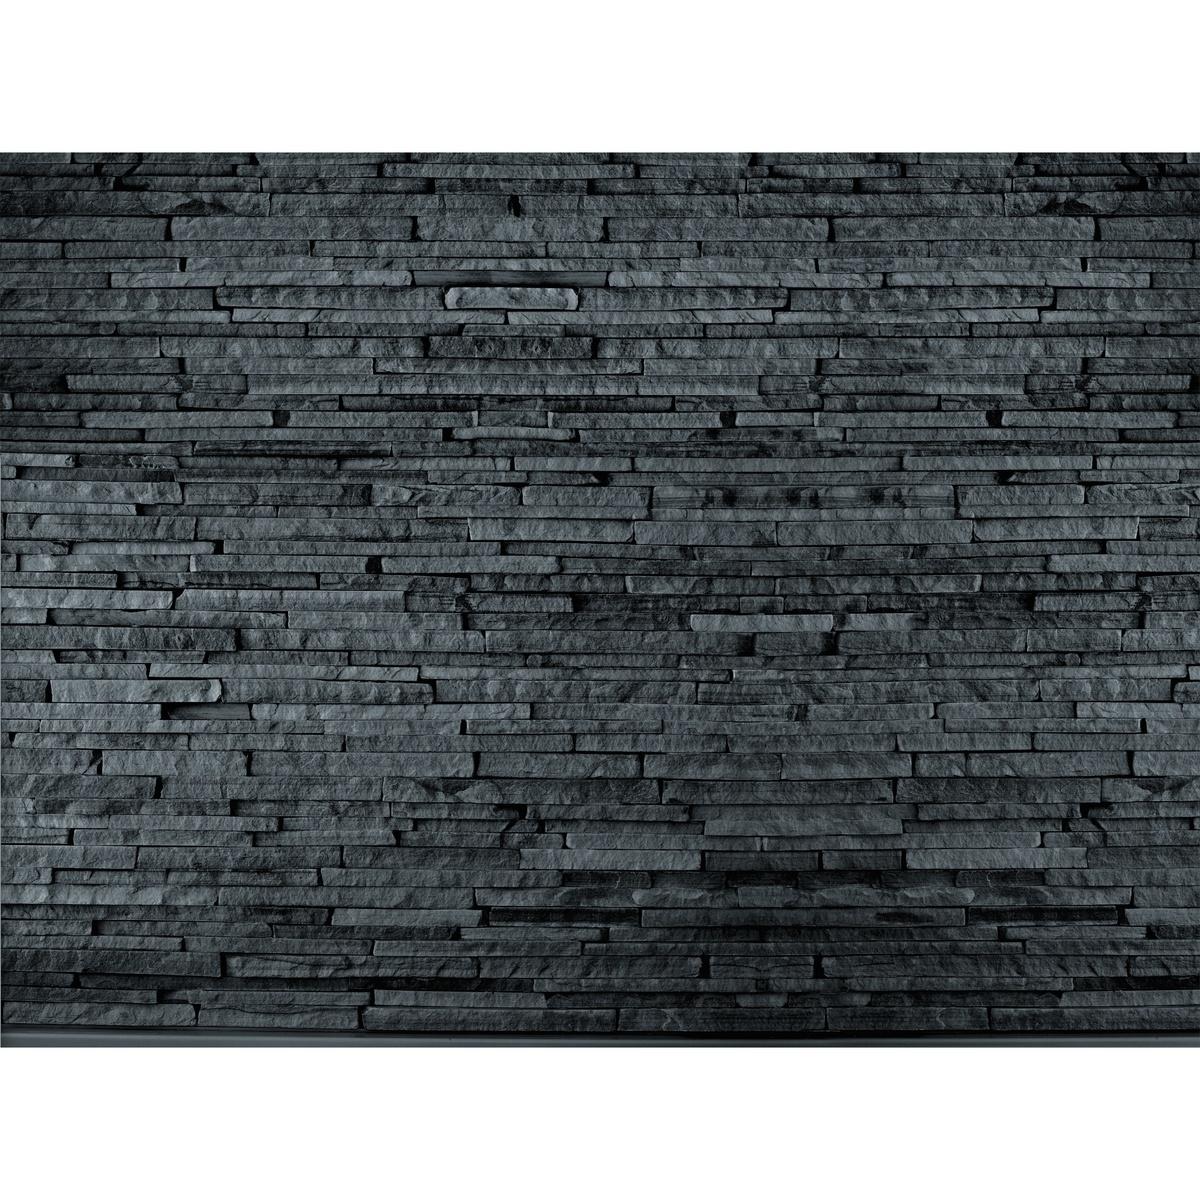 Fototapeta lámaný kameň černá 315 x 232 cm, Wall